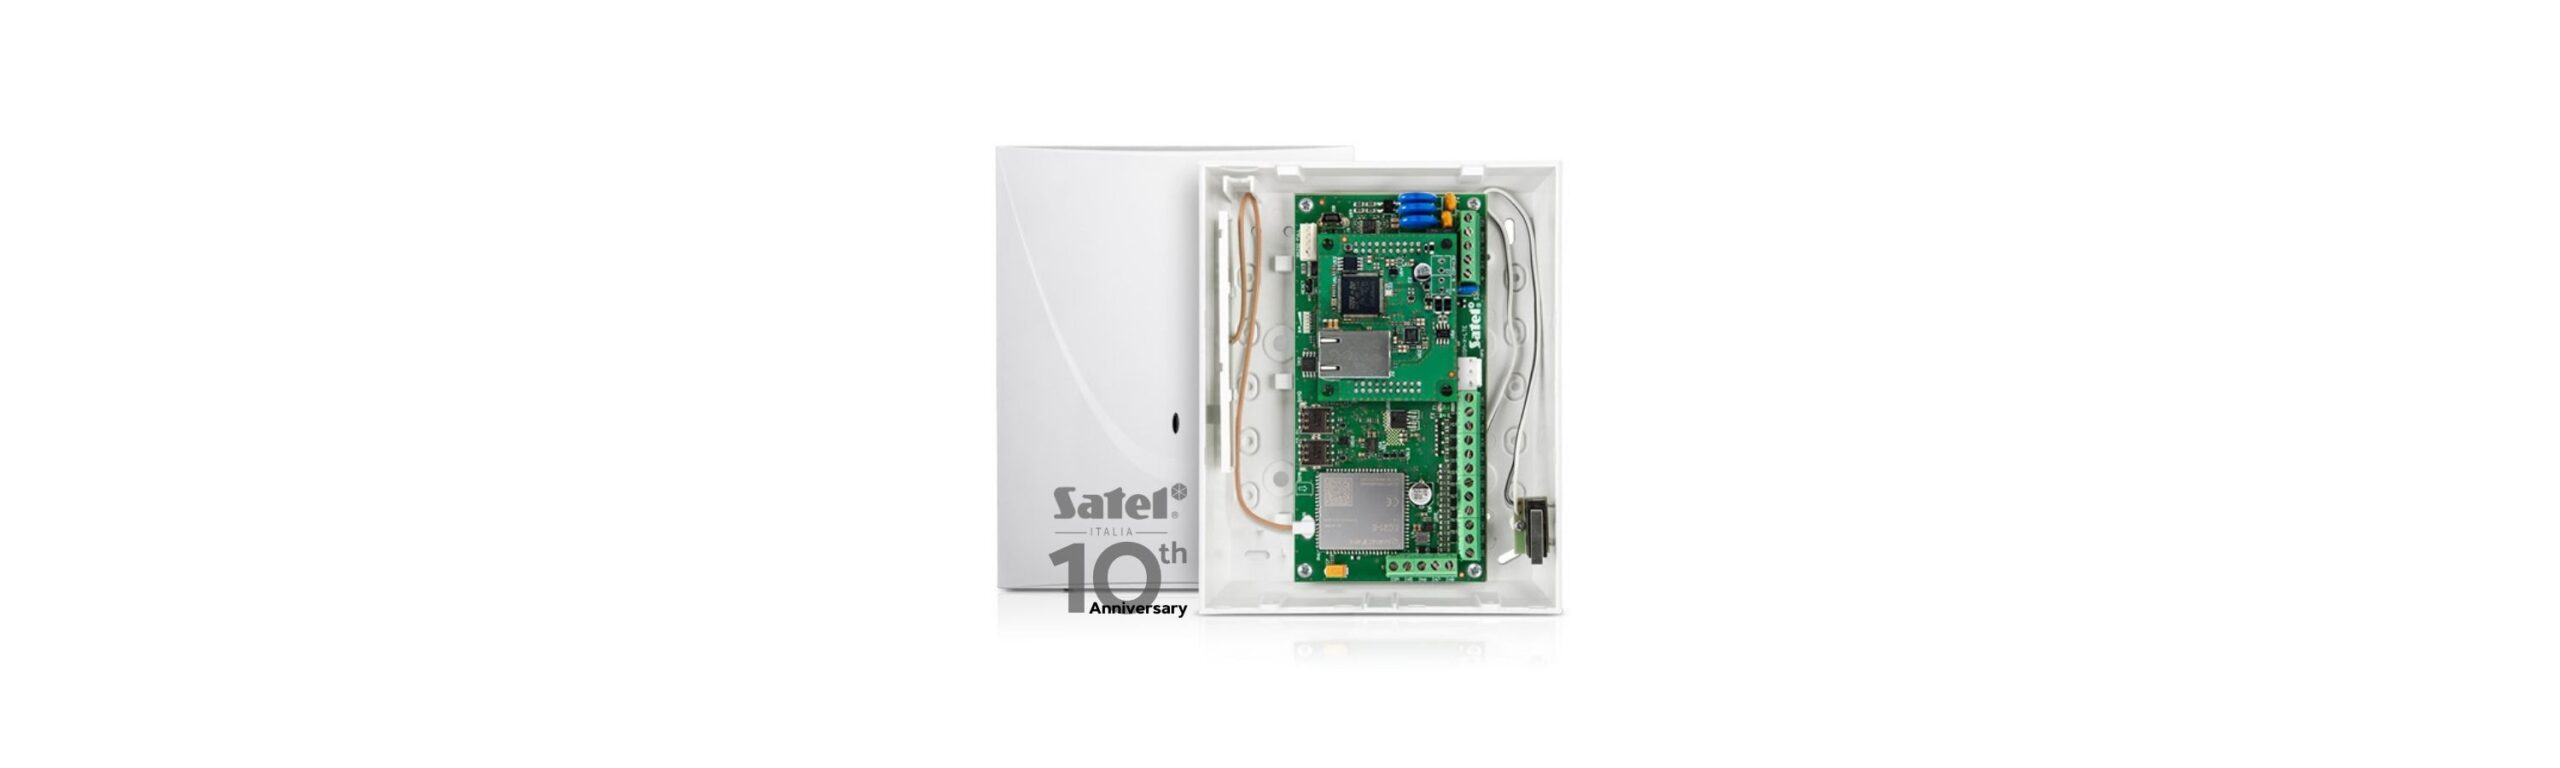 Satel Italia 10th Anniversary – GSM-X